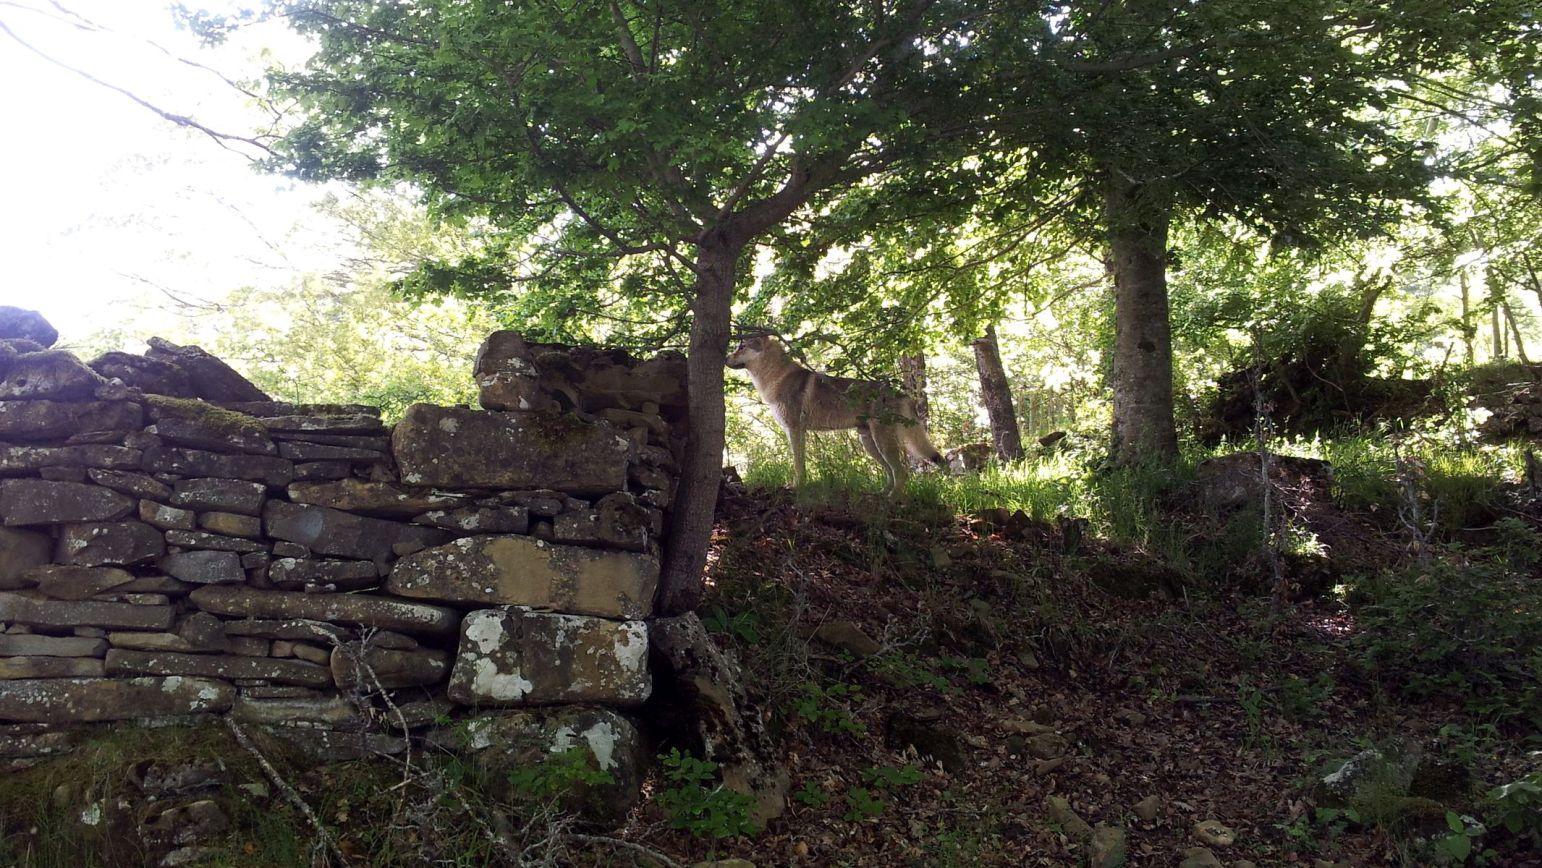 Ezechiele nel bosco a Campotosto7